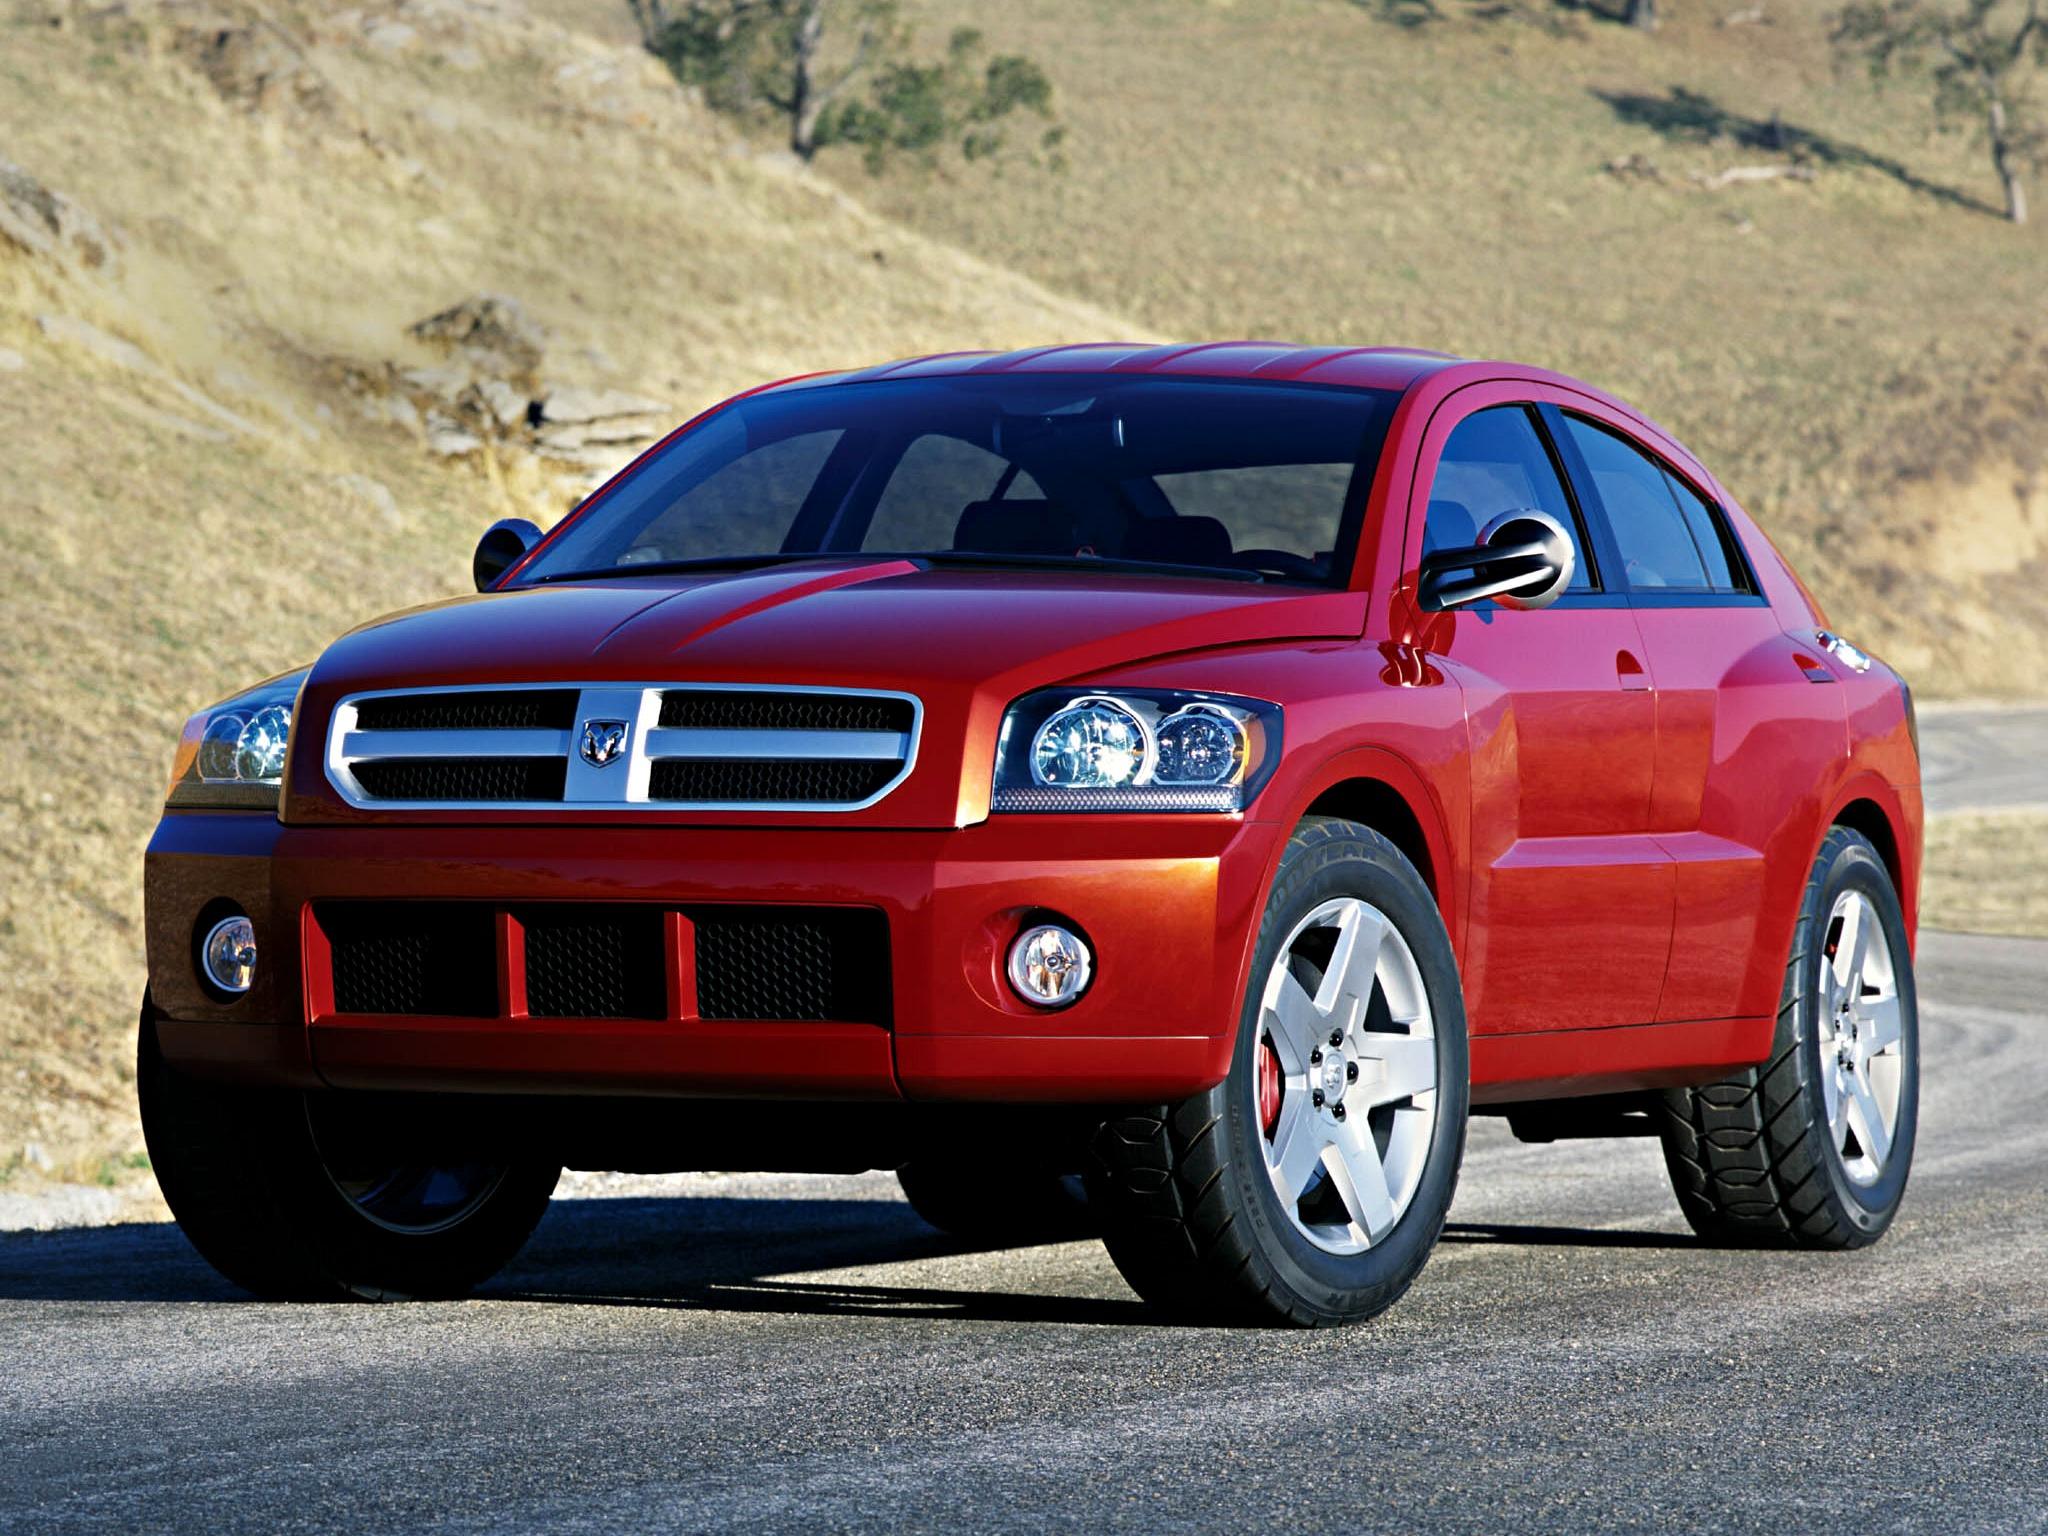 Hyundai Dealer Near Me >> Dodge Avenger Concept (2003) - Old Concept Cars